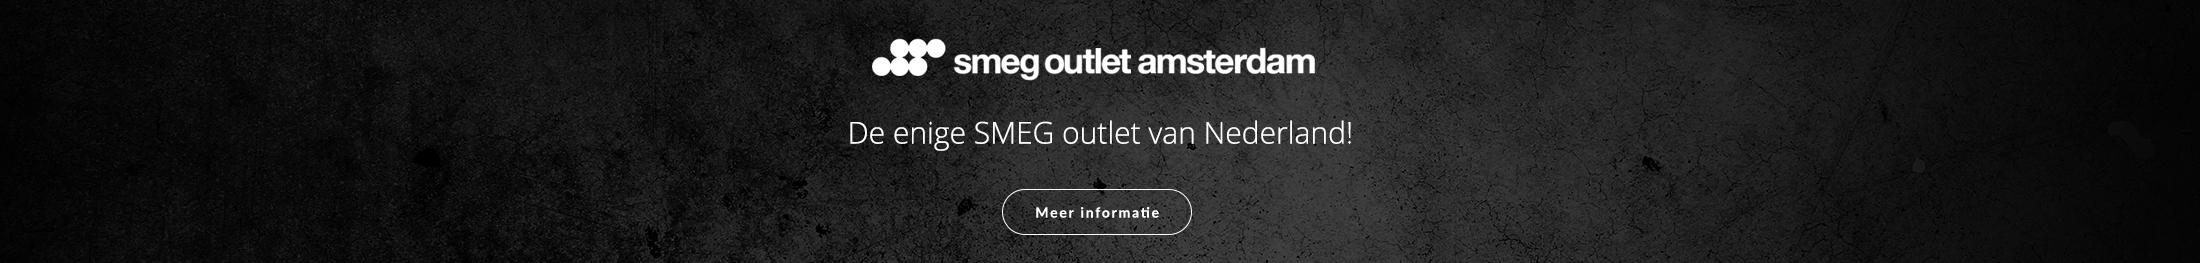 Smeg outlet